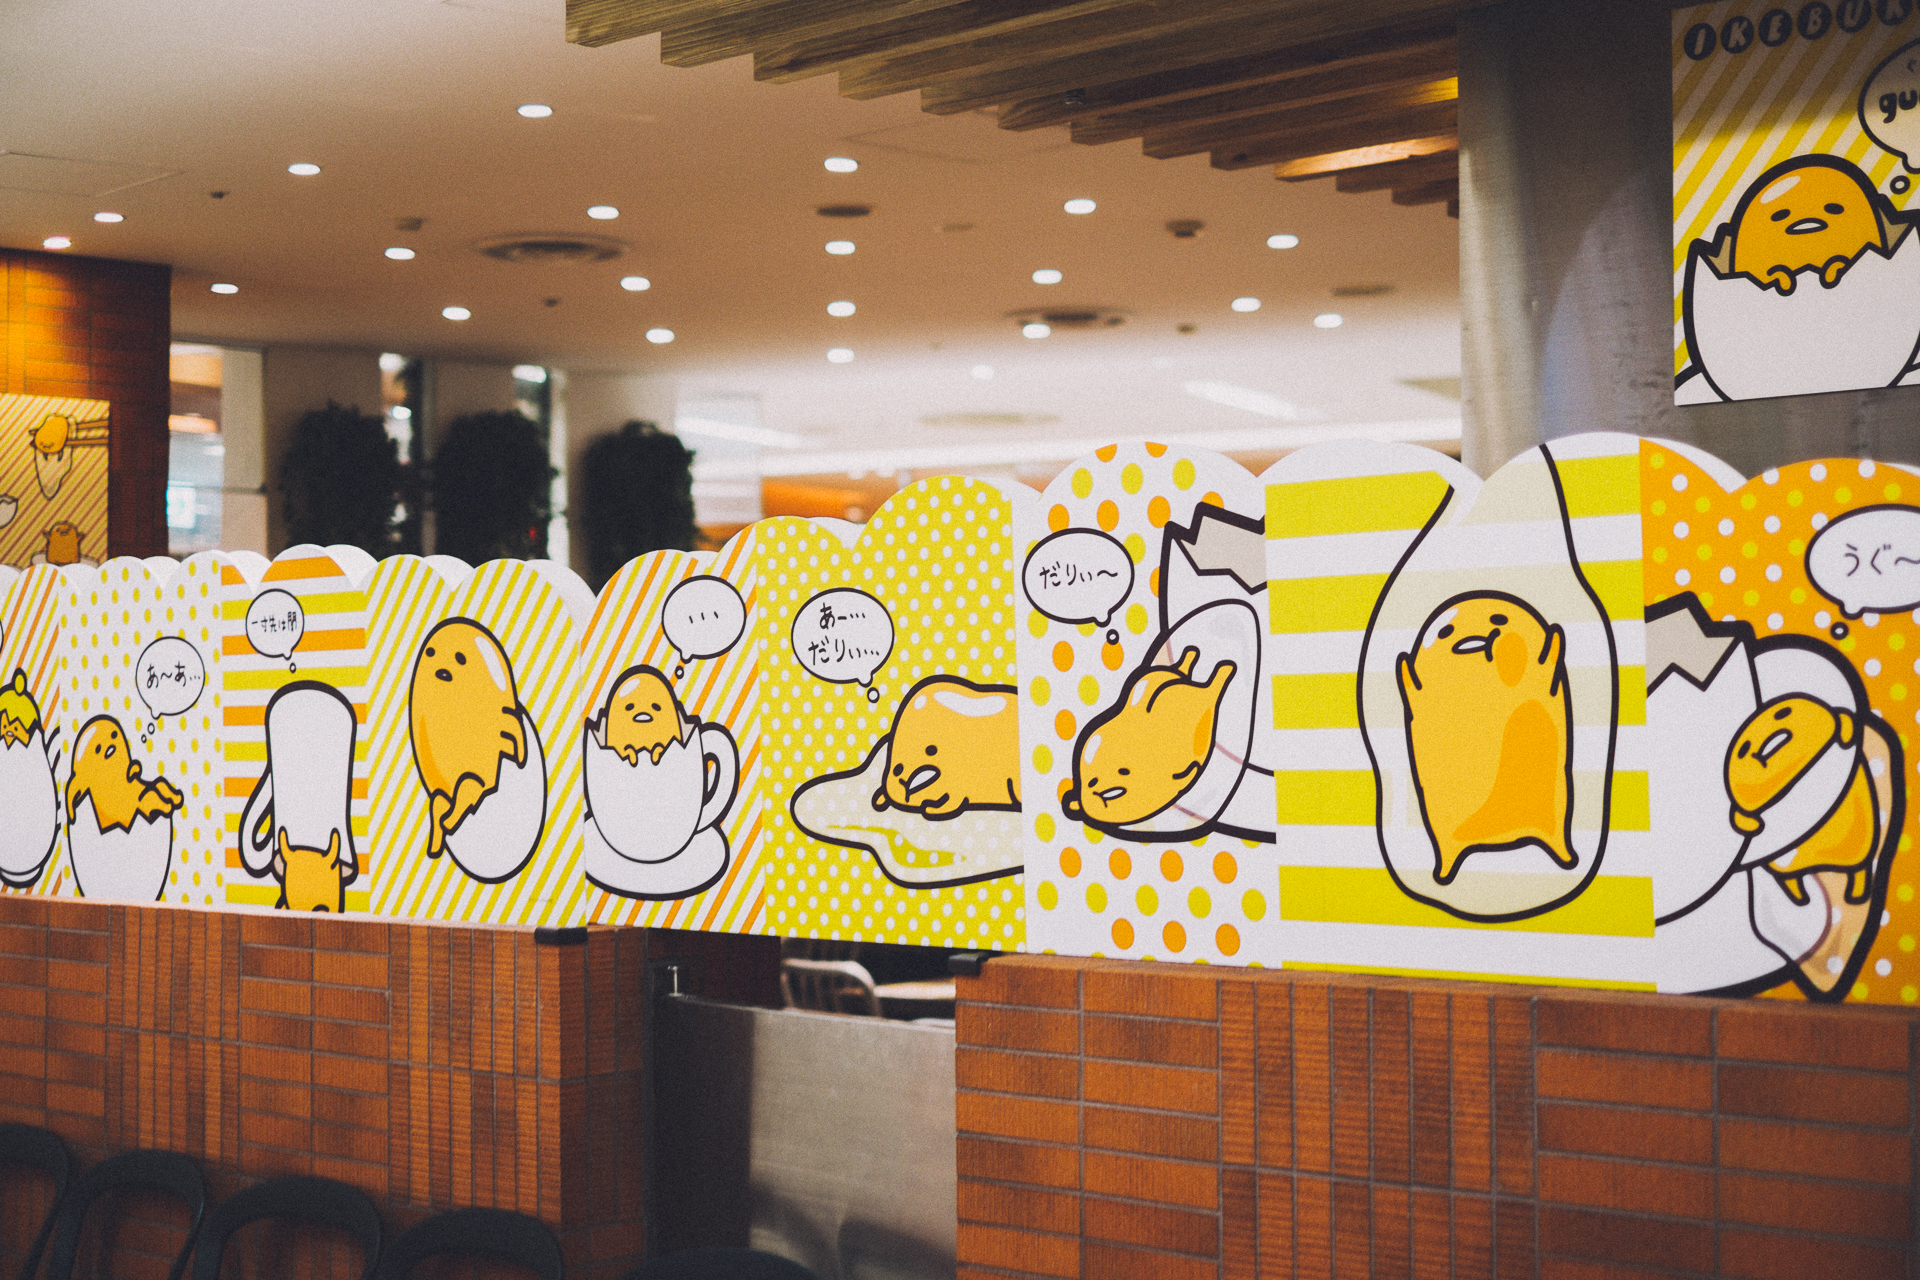 gudetama-cafe-tokyo-31.jpg